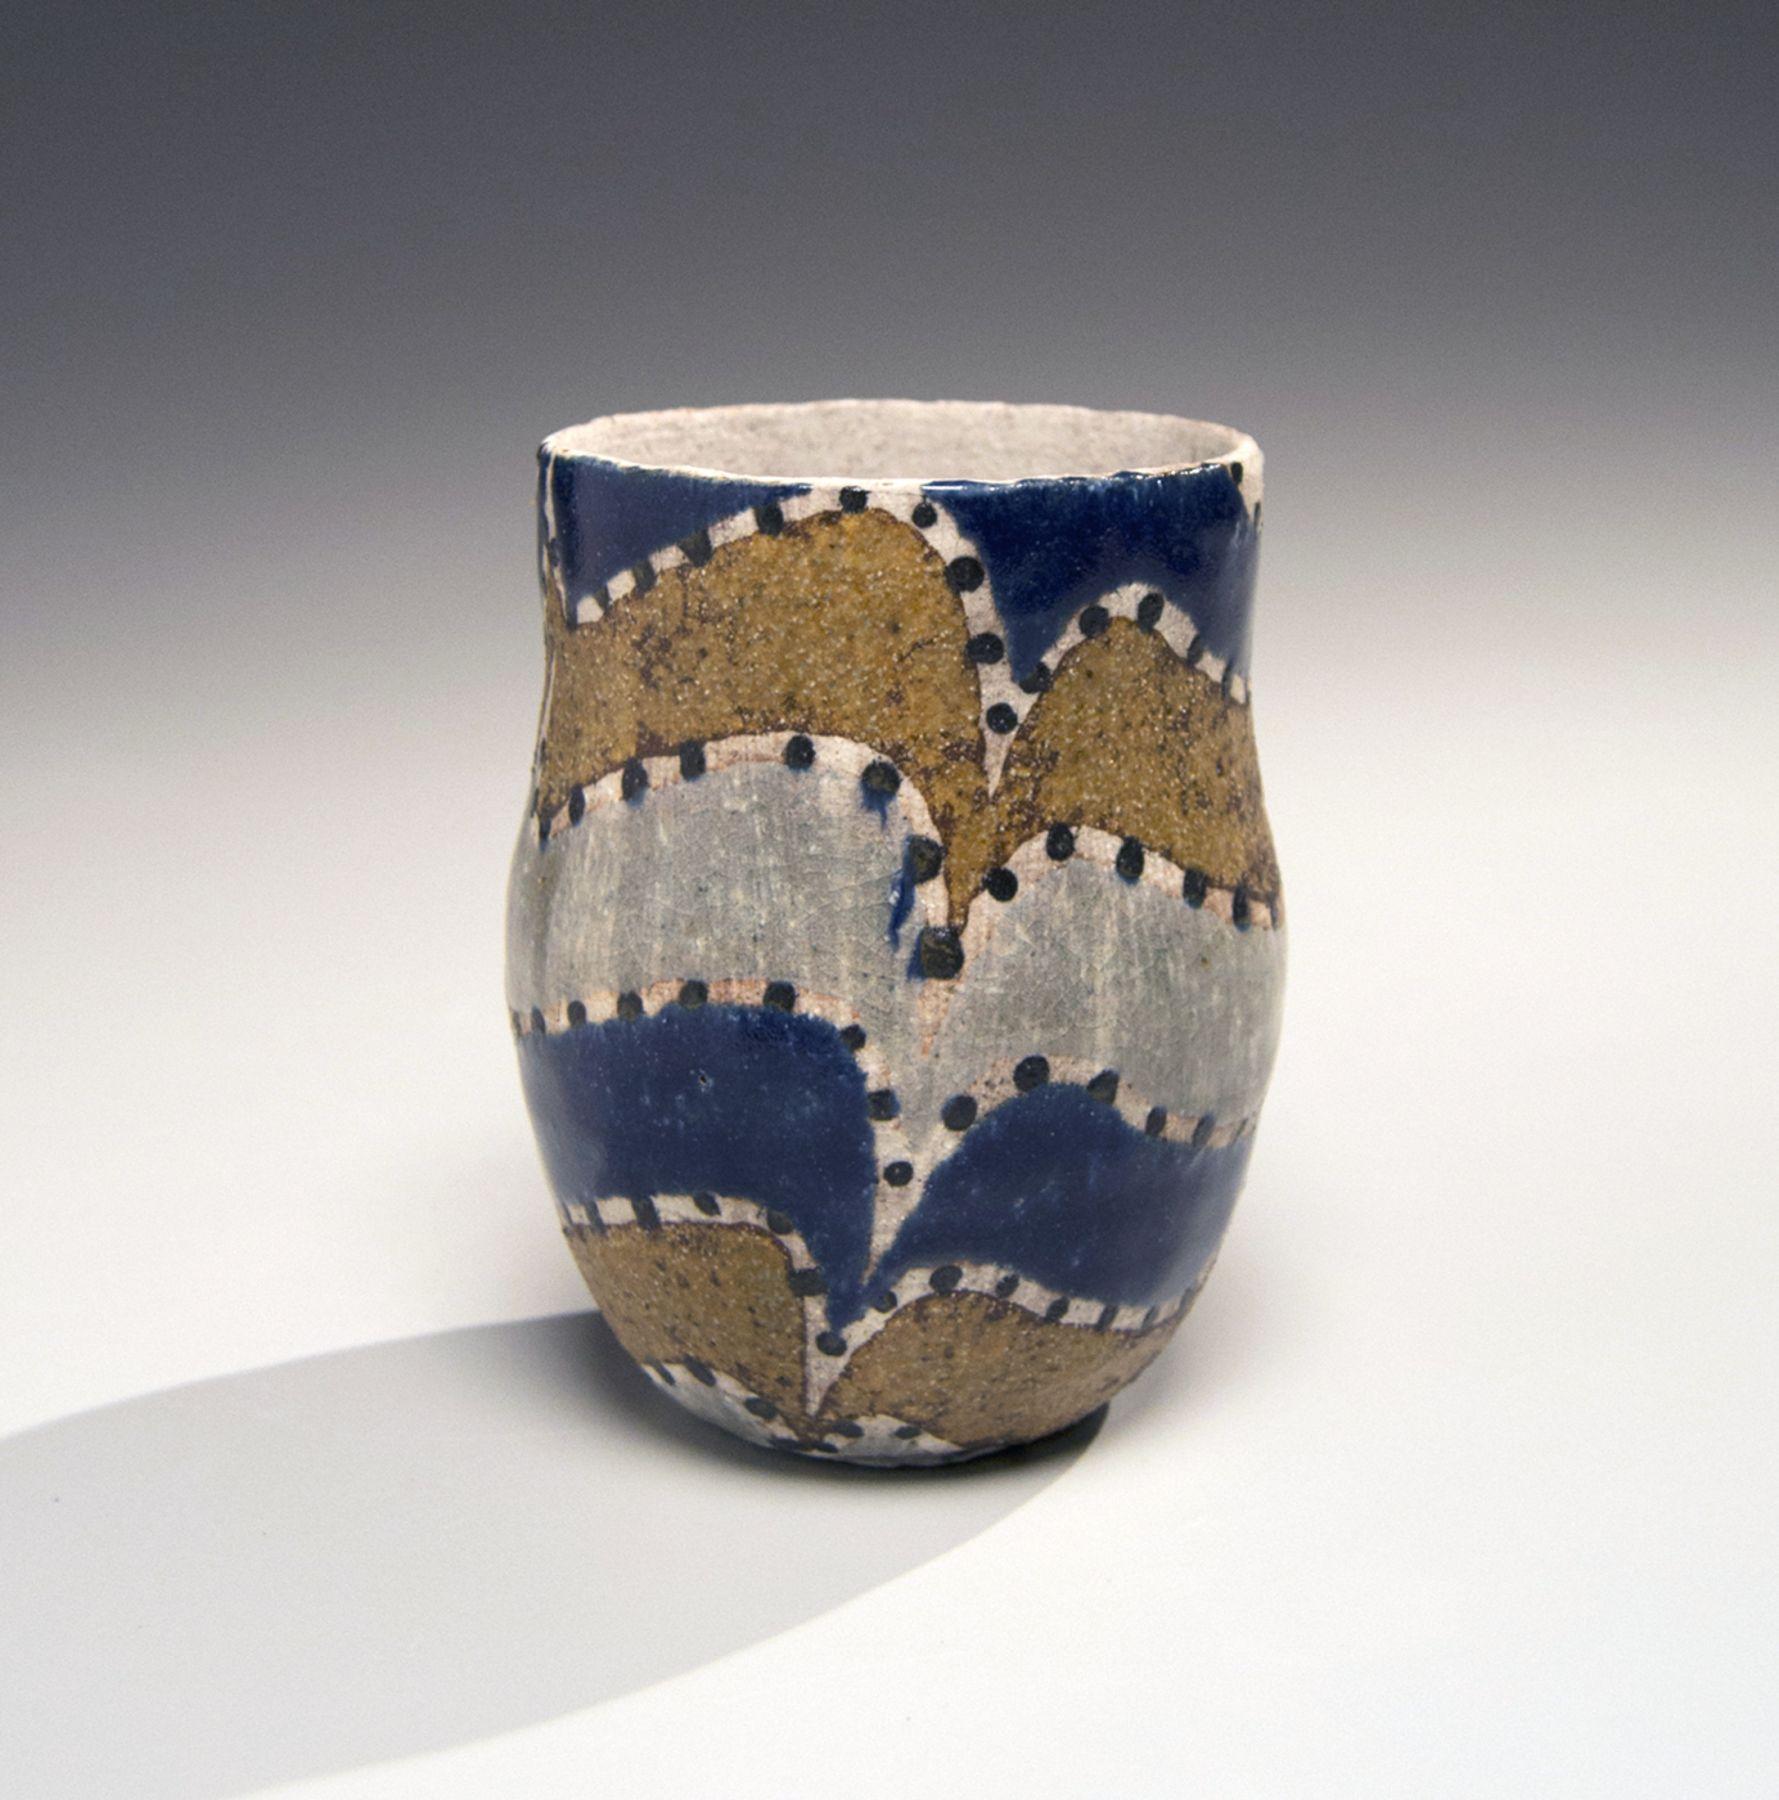 Kamoda Shōji, Small vessel with tri-color wave pattern